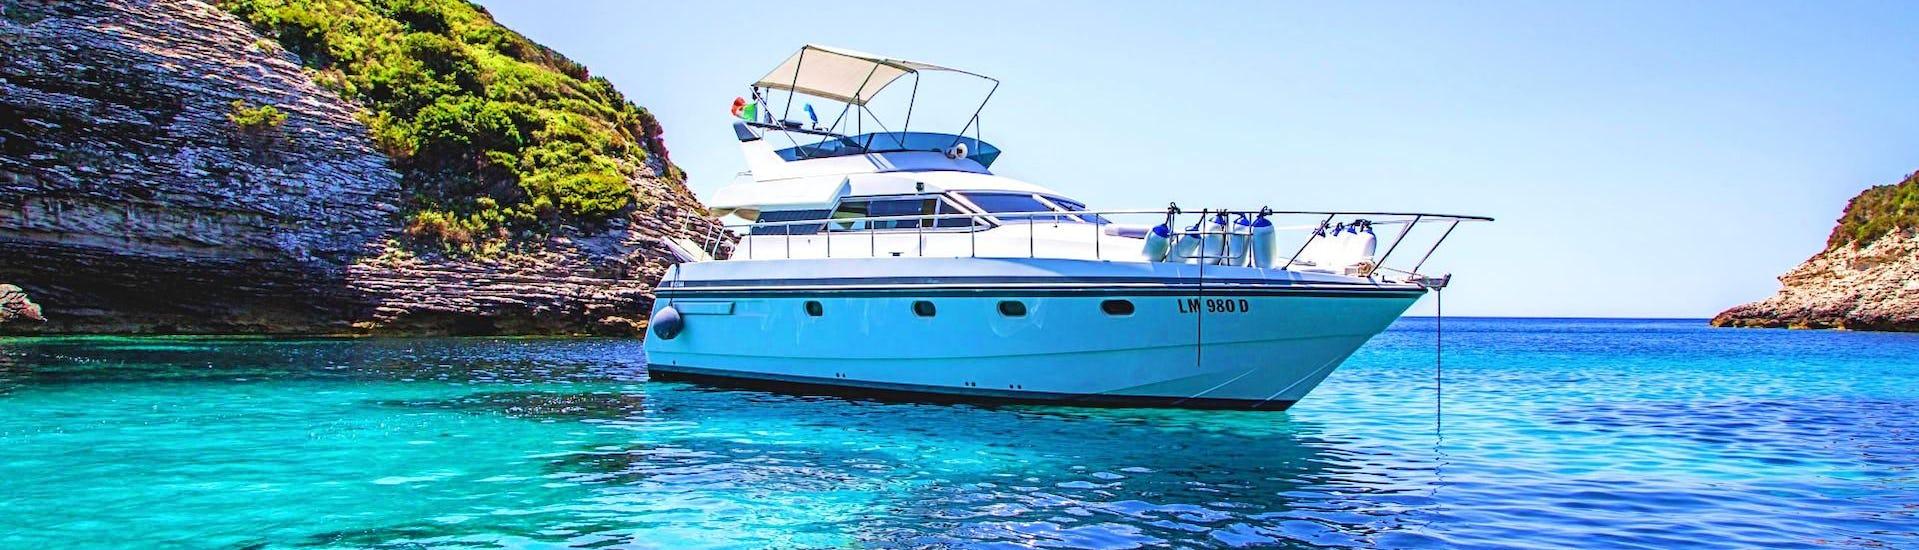 Private Boat Trip from North Sardinia to Sardinia or Corsica